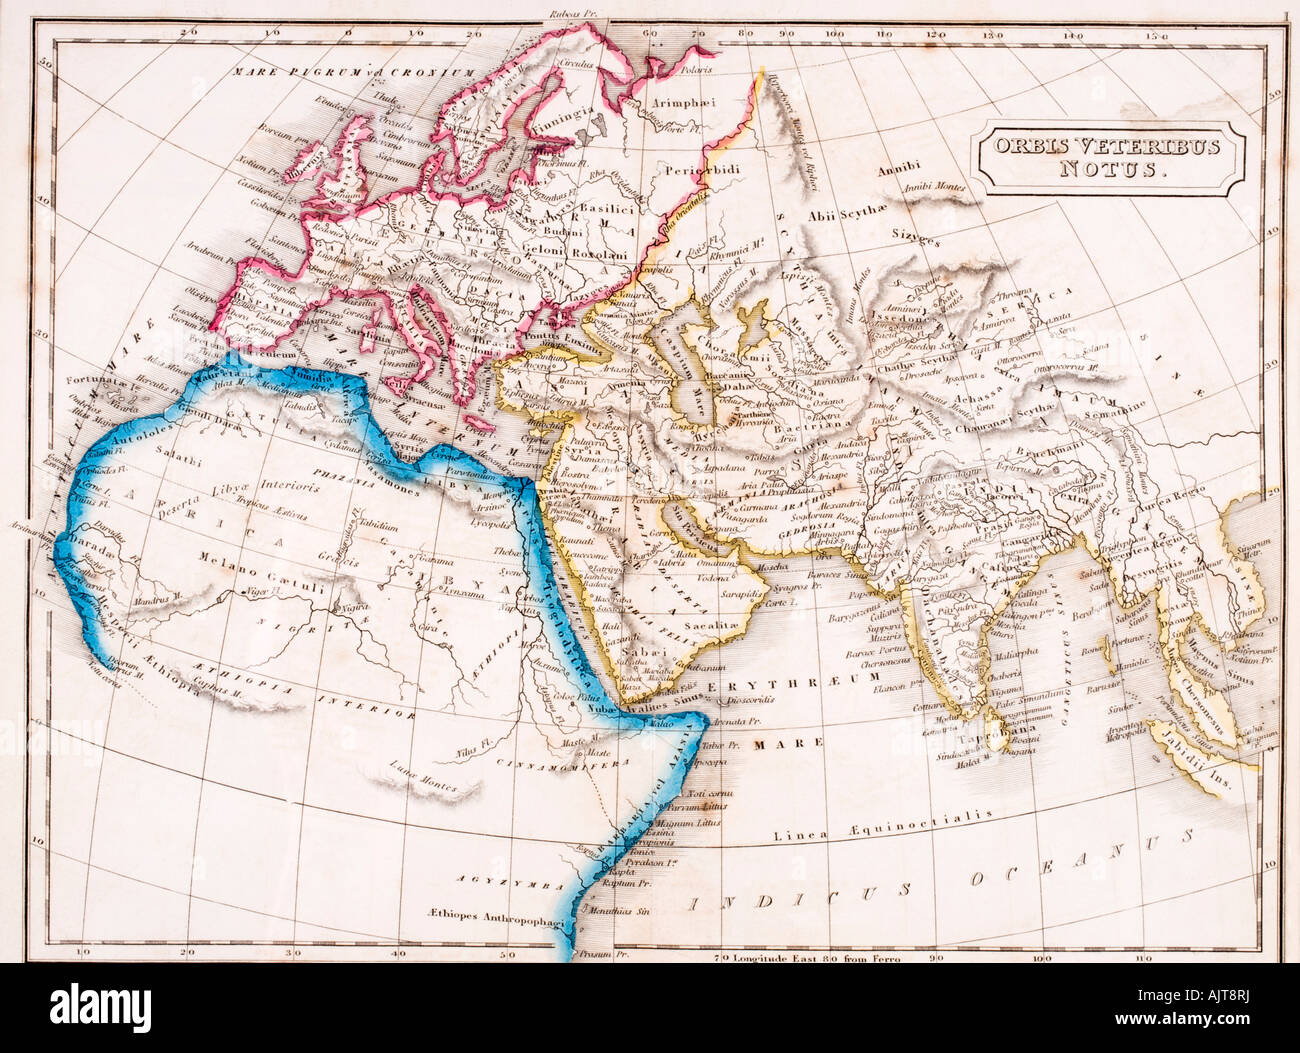 Europe Africa Map Stockfotos & Europe Africa Map Bilder - Alamy